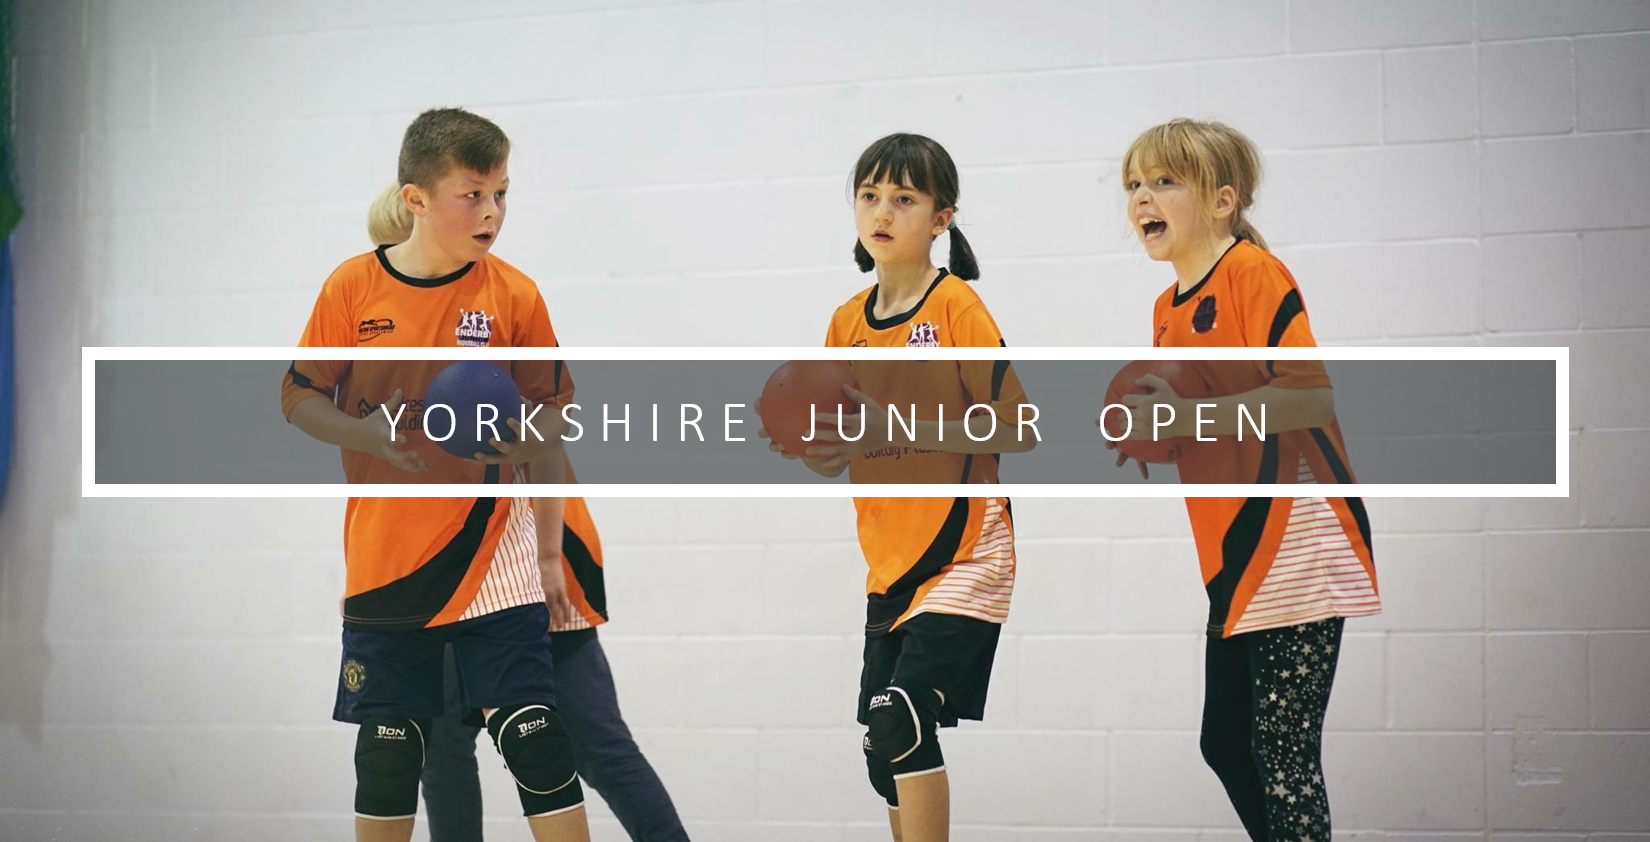 Yorkshire Junior